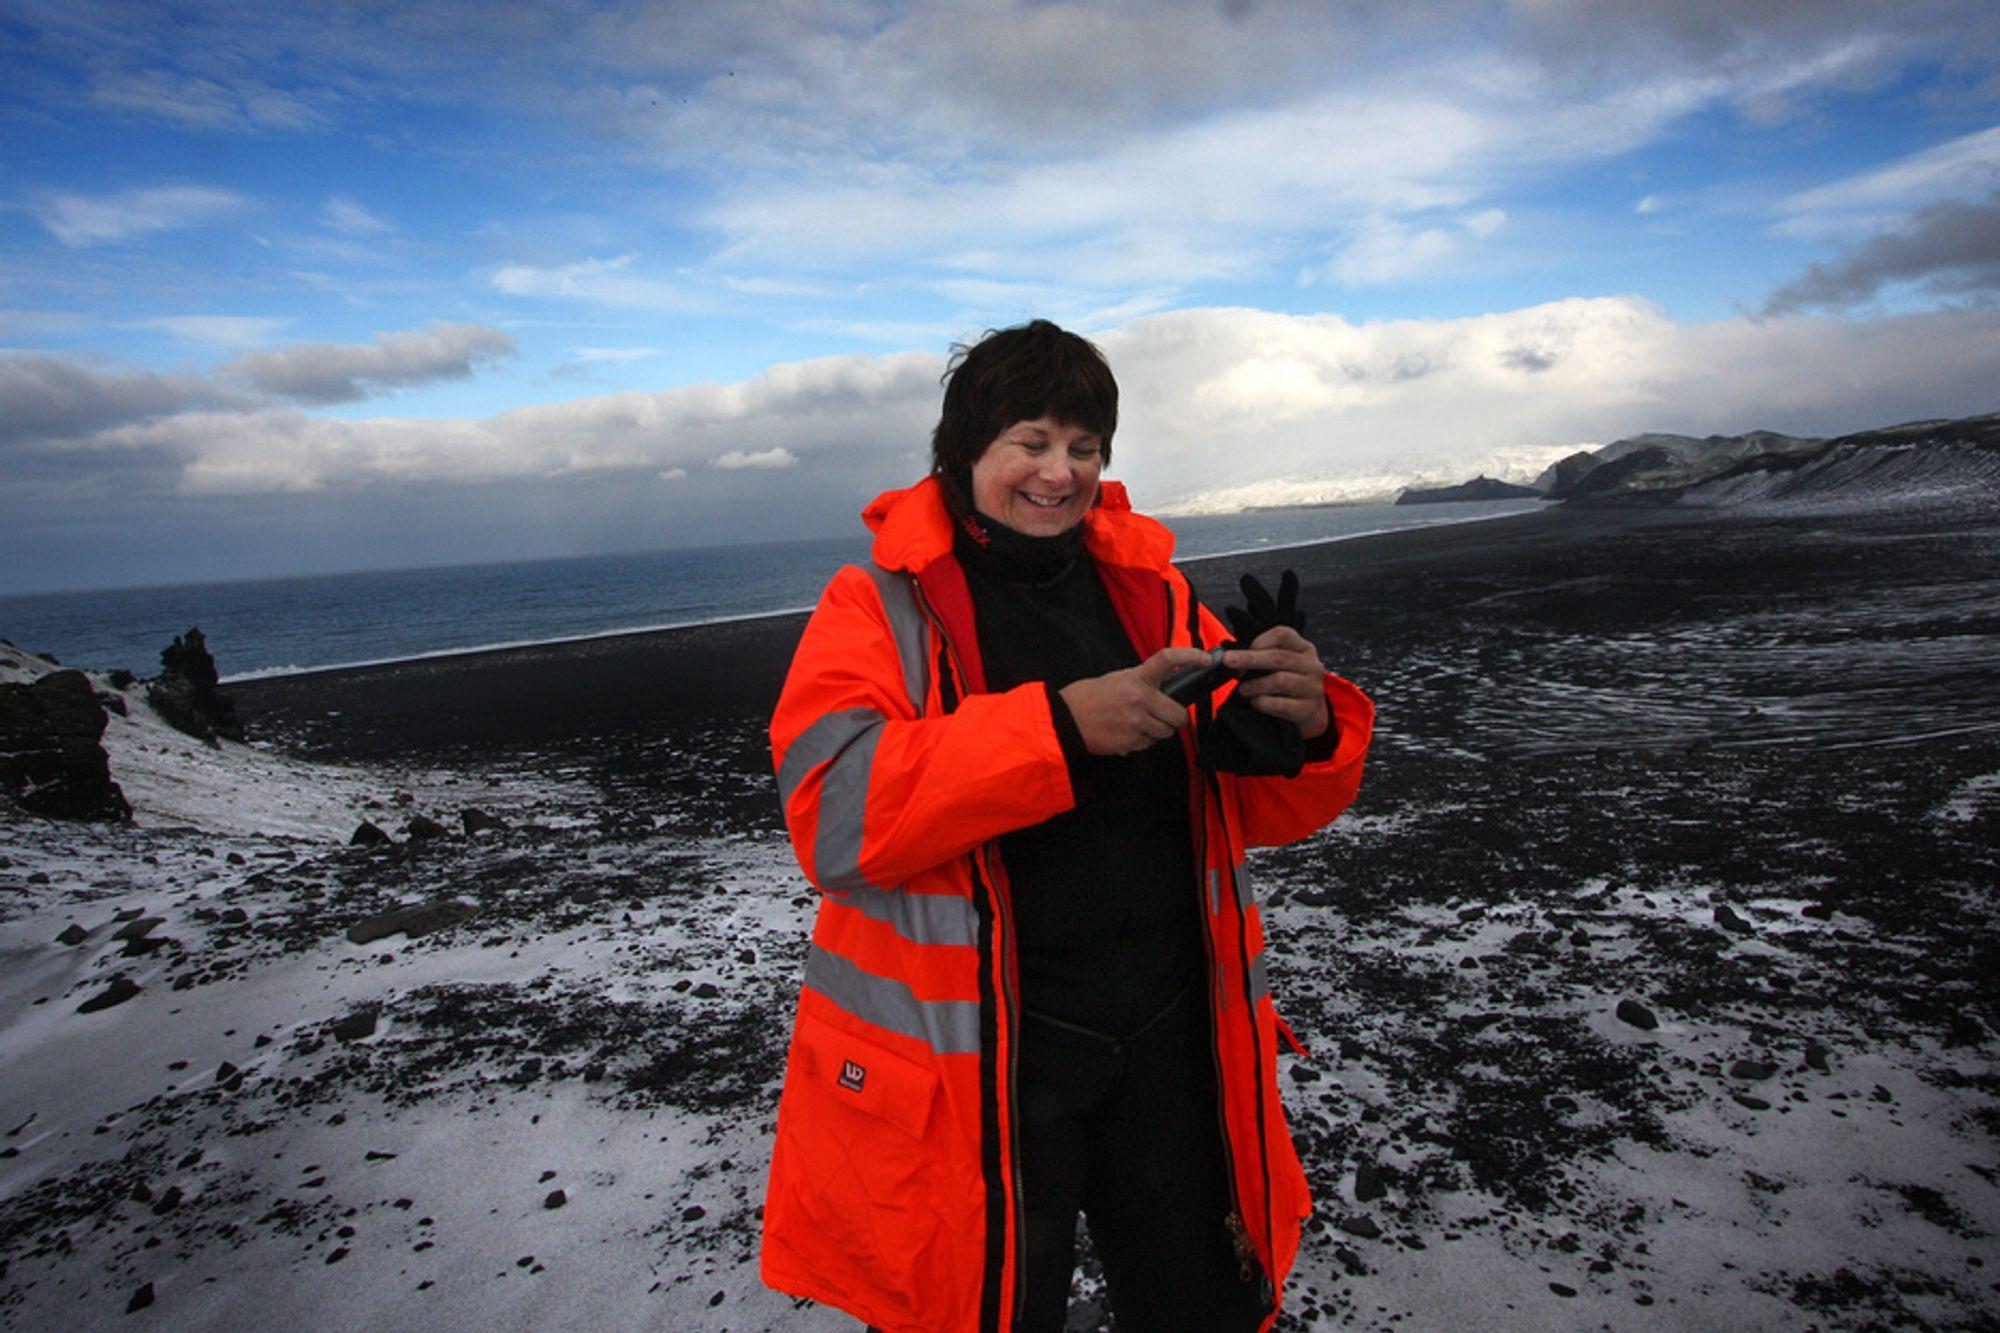 Direktør i Oljedirektoratet Bente Nyland inspiserte Jan Mayen allerede i 2009.